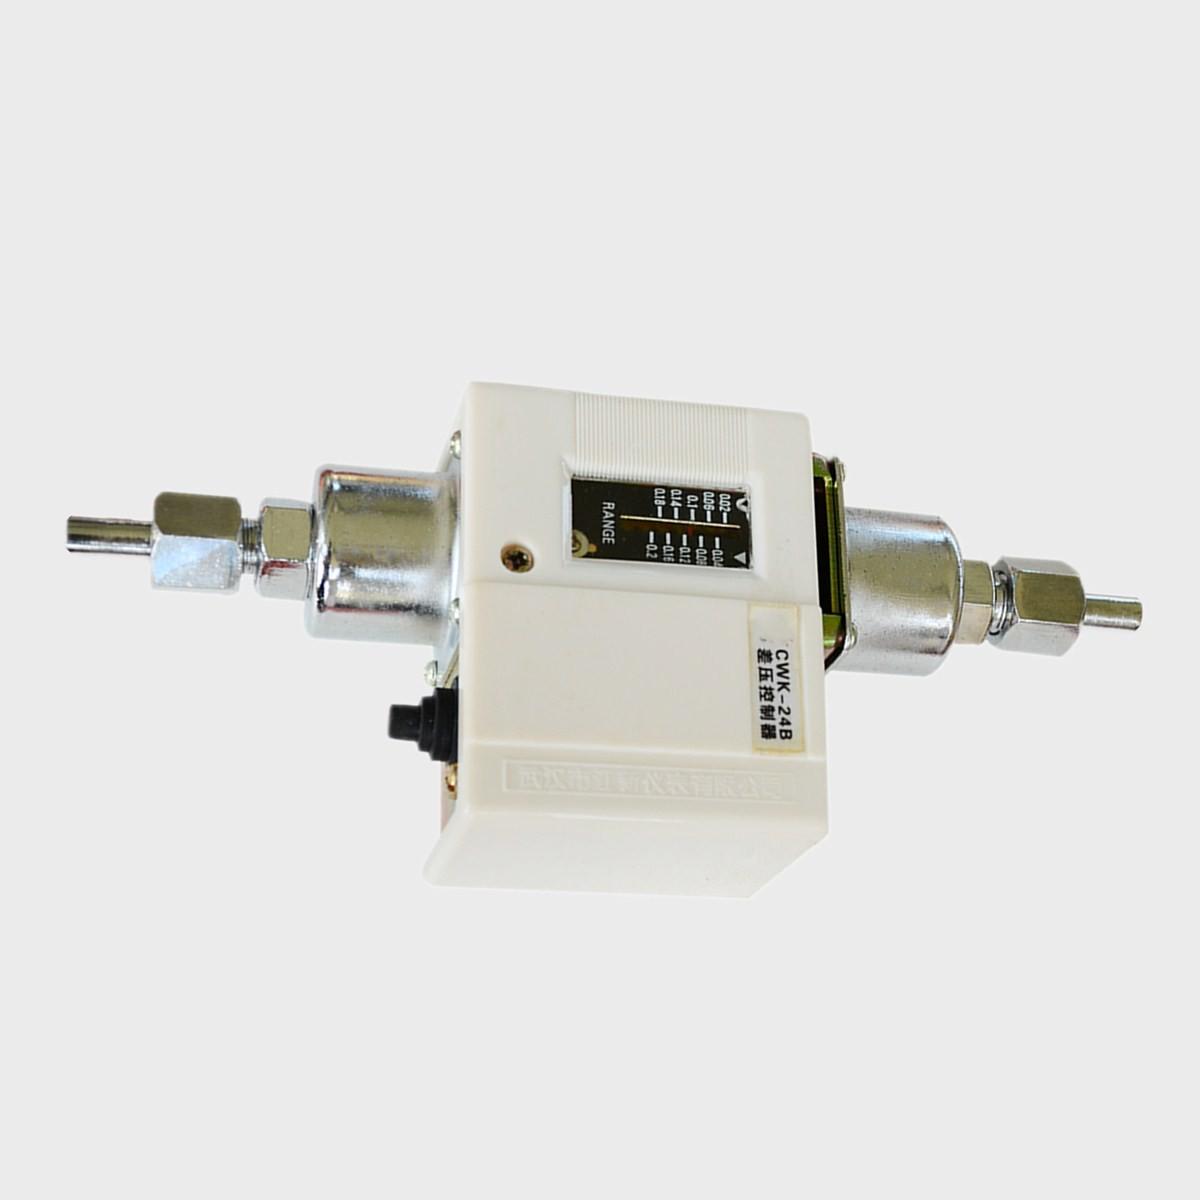 Differential pressure switch CWK-24B Manufacturers, Differential pressure switch CWK-24B Factory, Supply Differential pressure switch CWK-24B